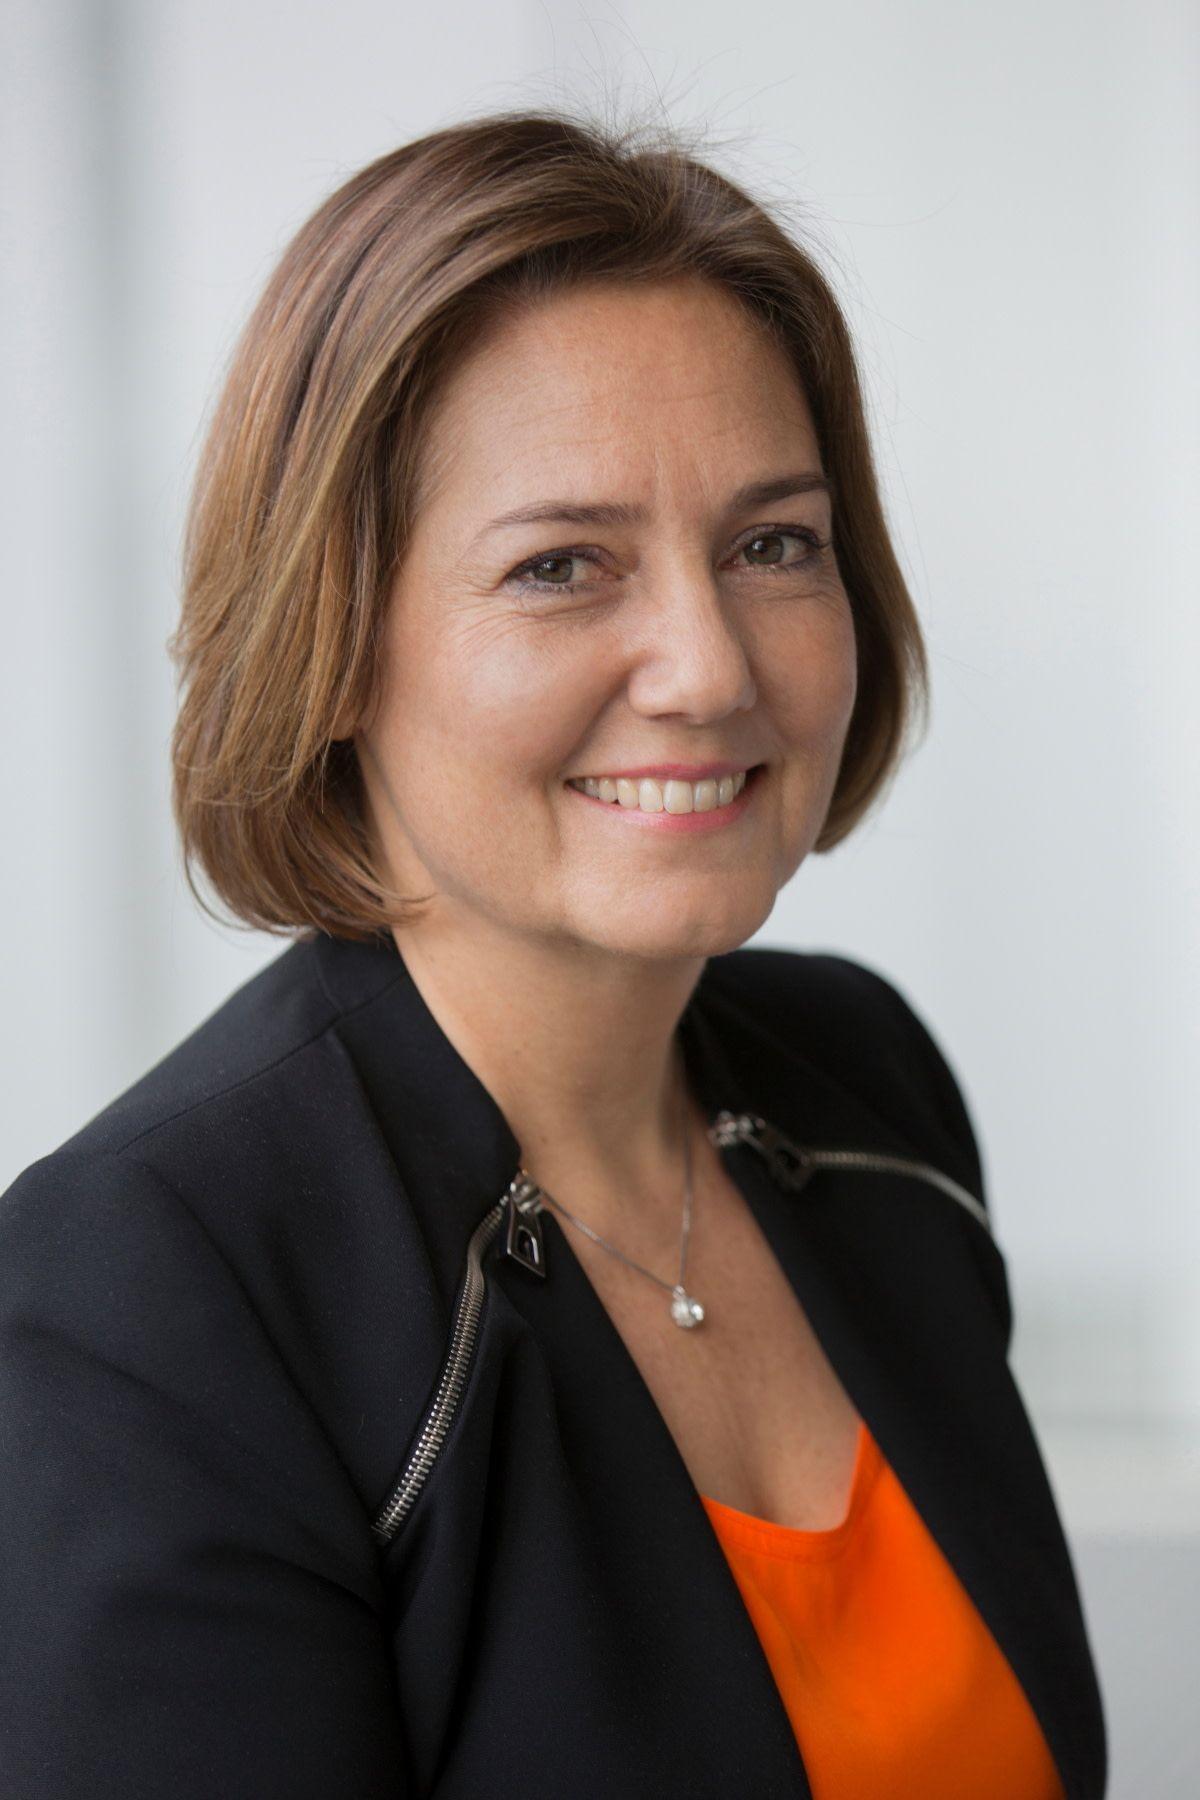 Rachel Picard elected Chair of Criteo Board of Directors, Criteo